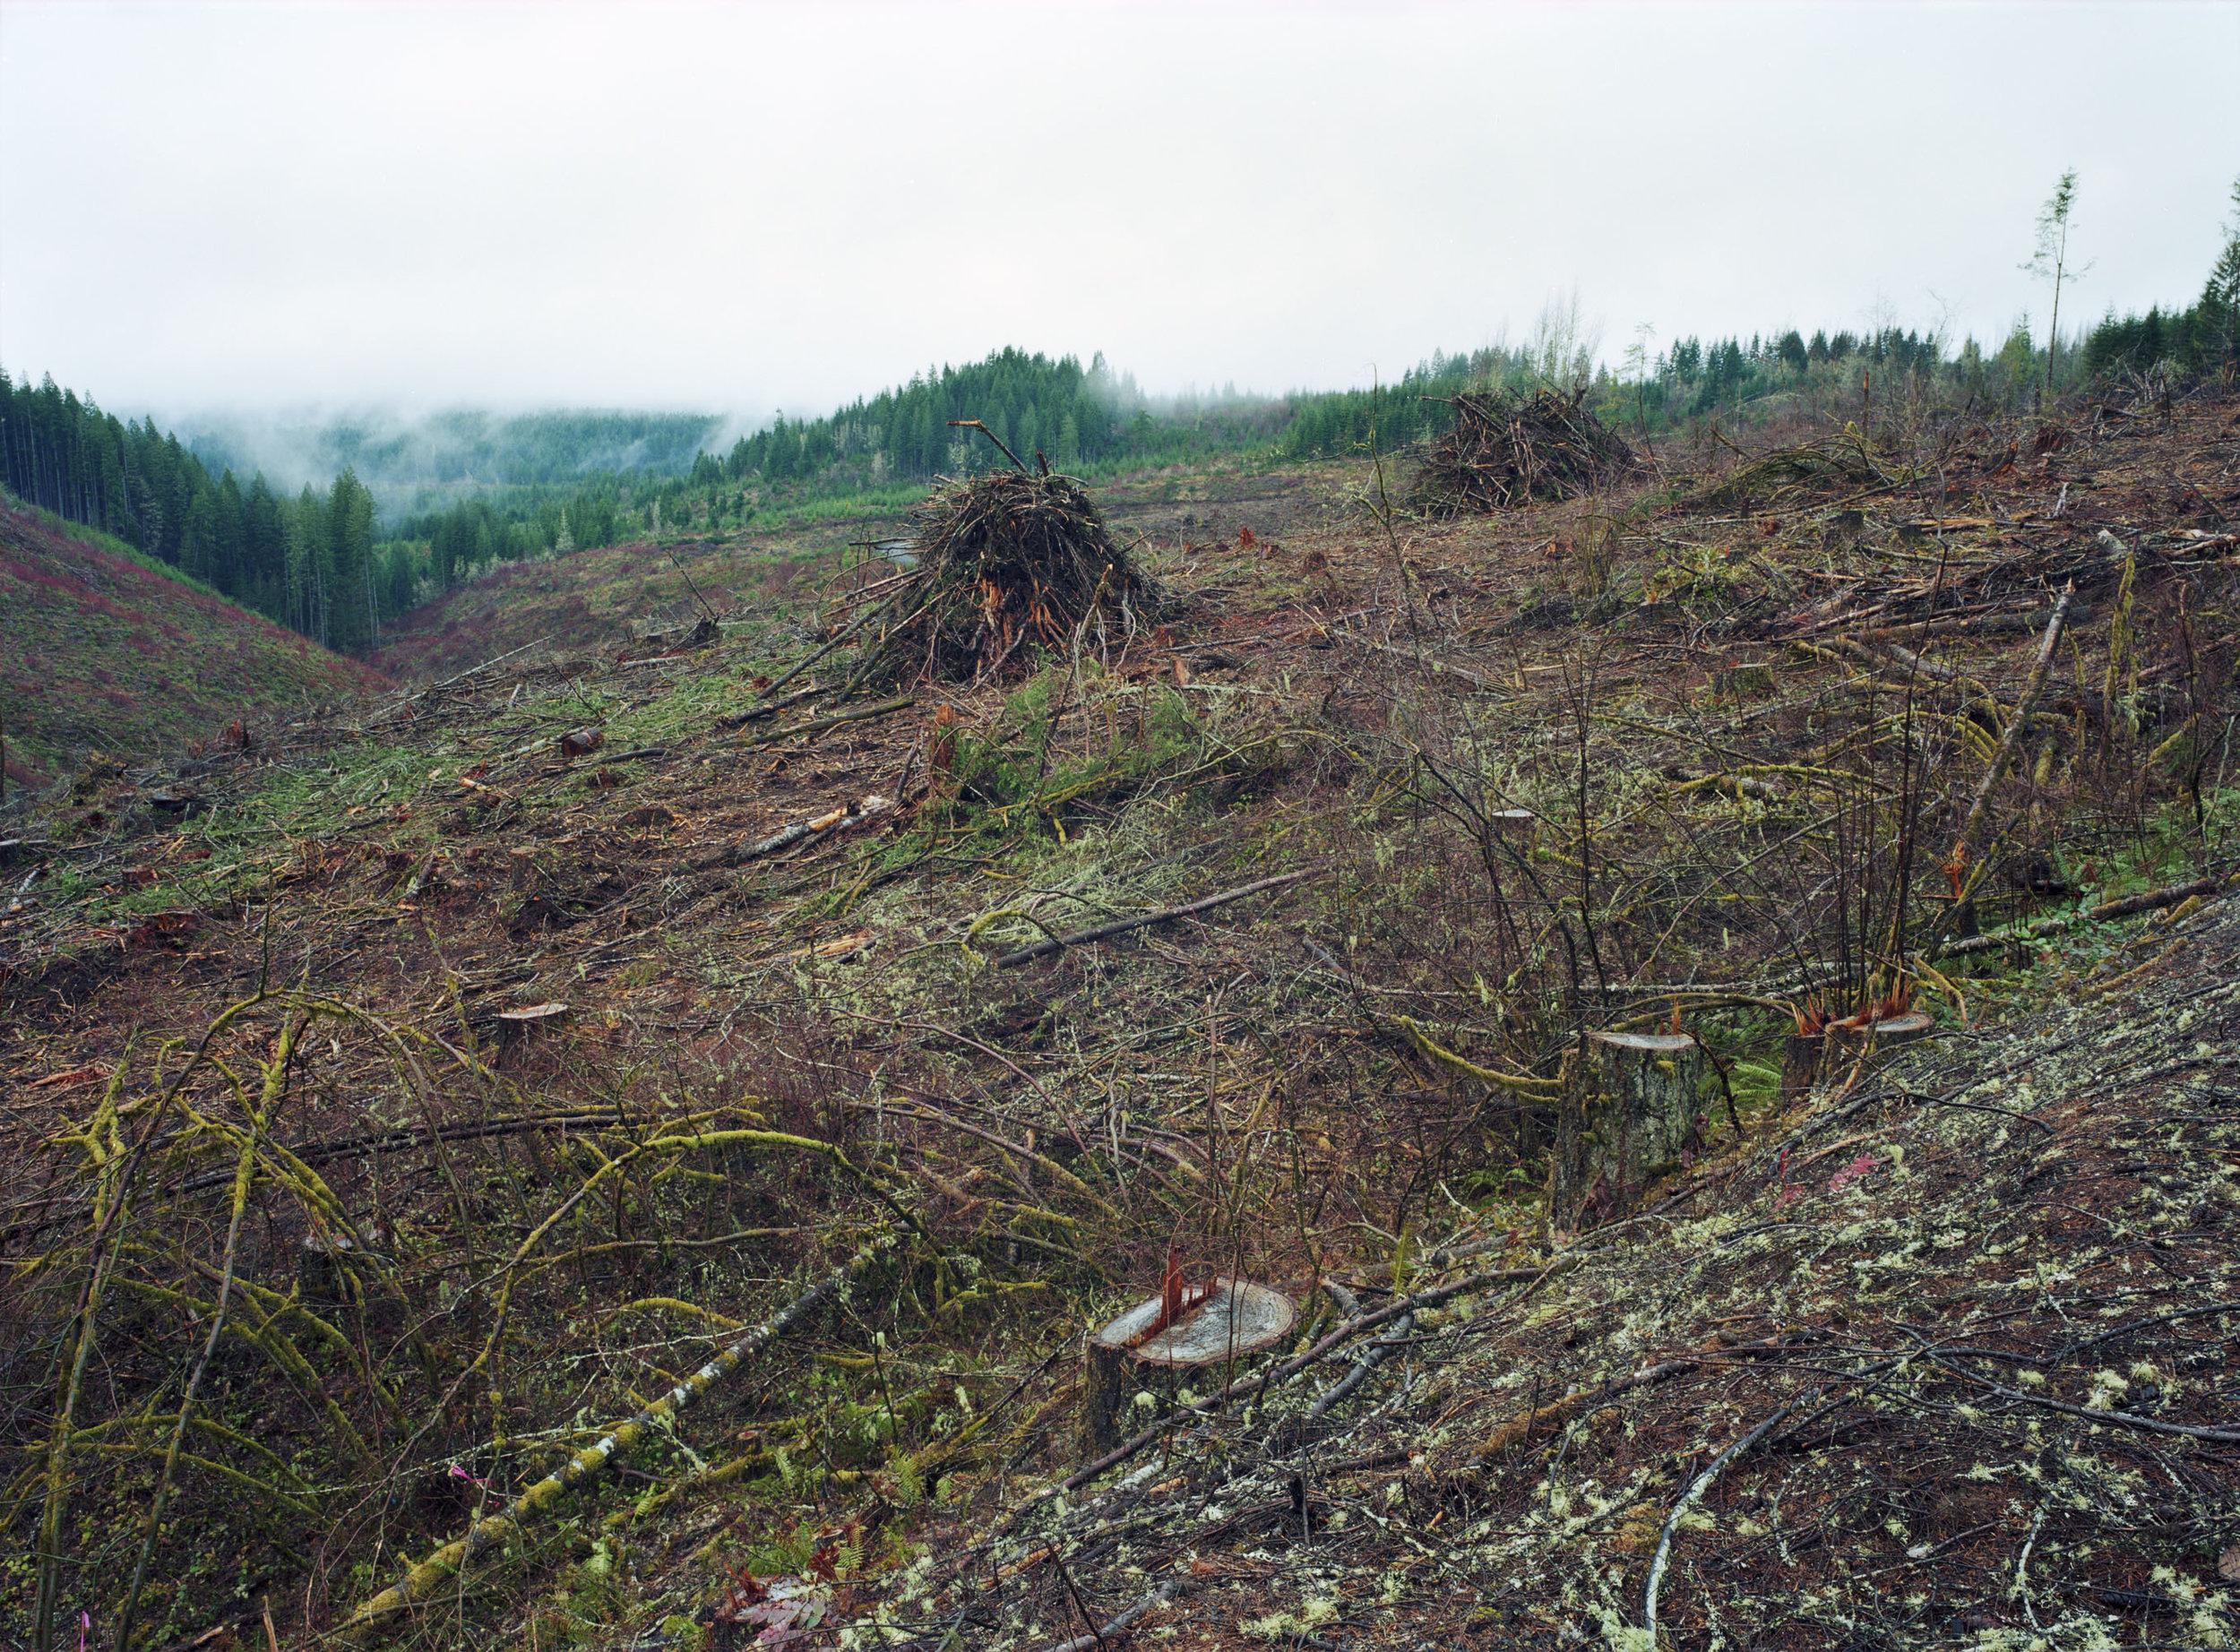 Clatsop, Oregon 2014